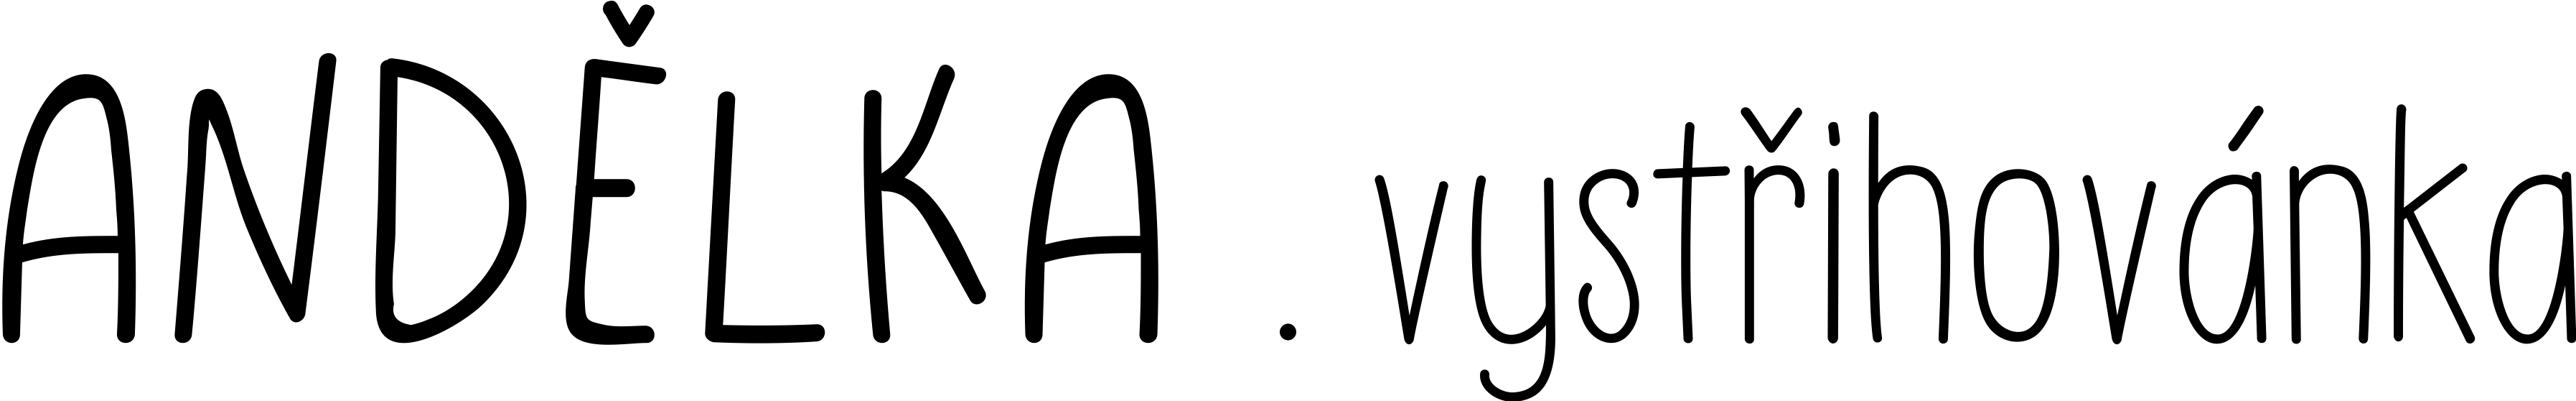 andelka